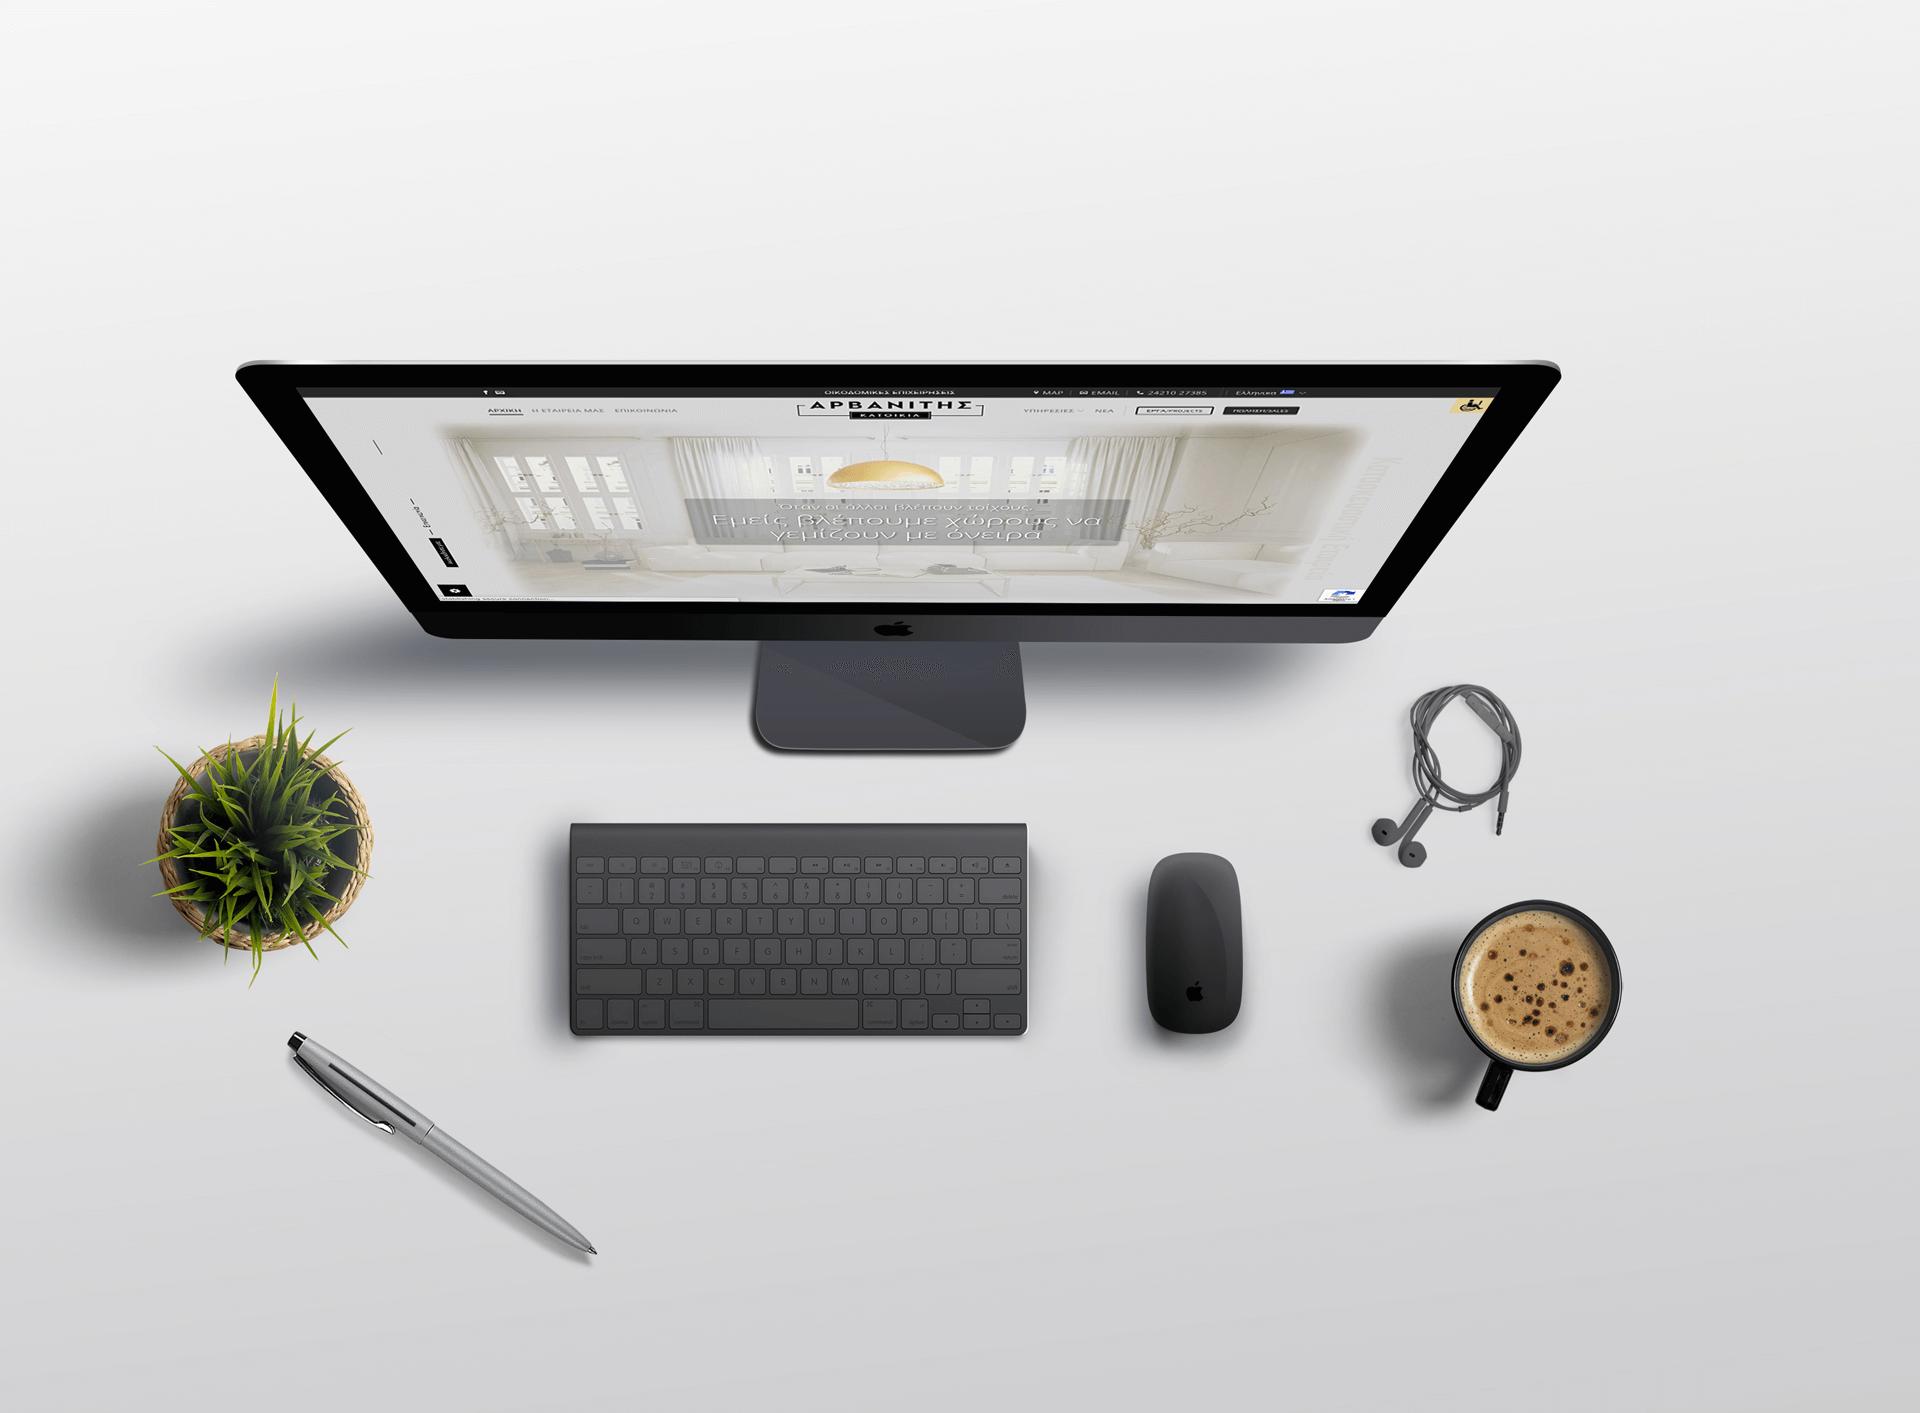 iMac-Top-View-10